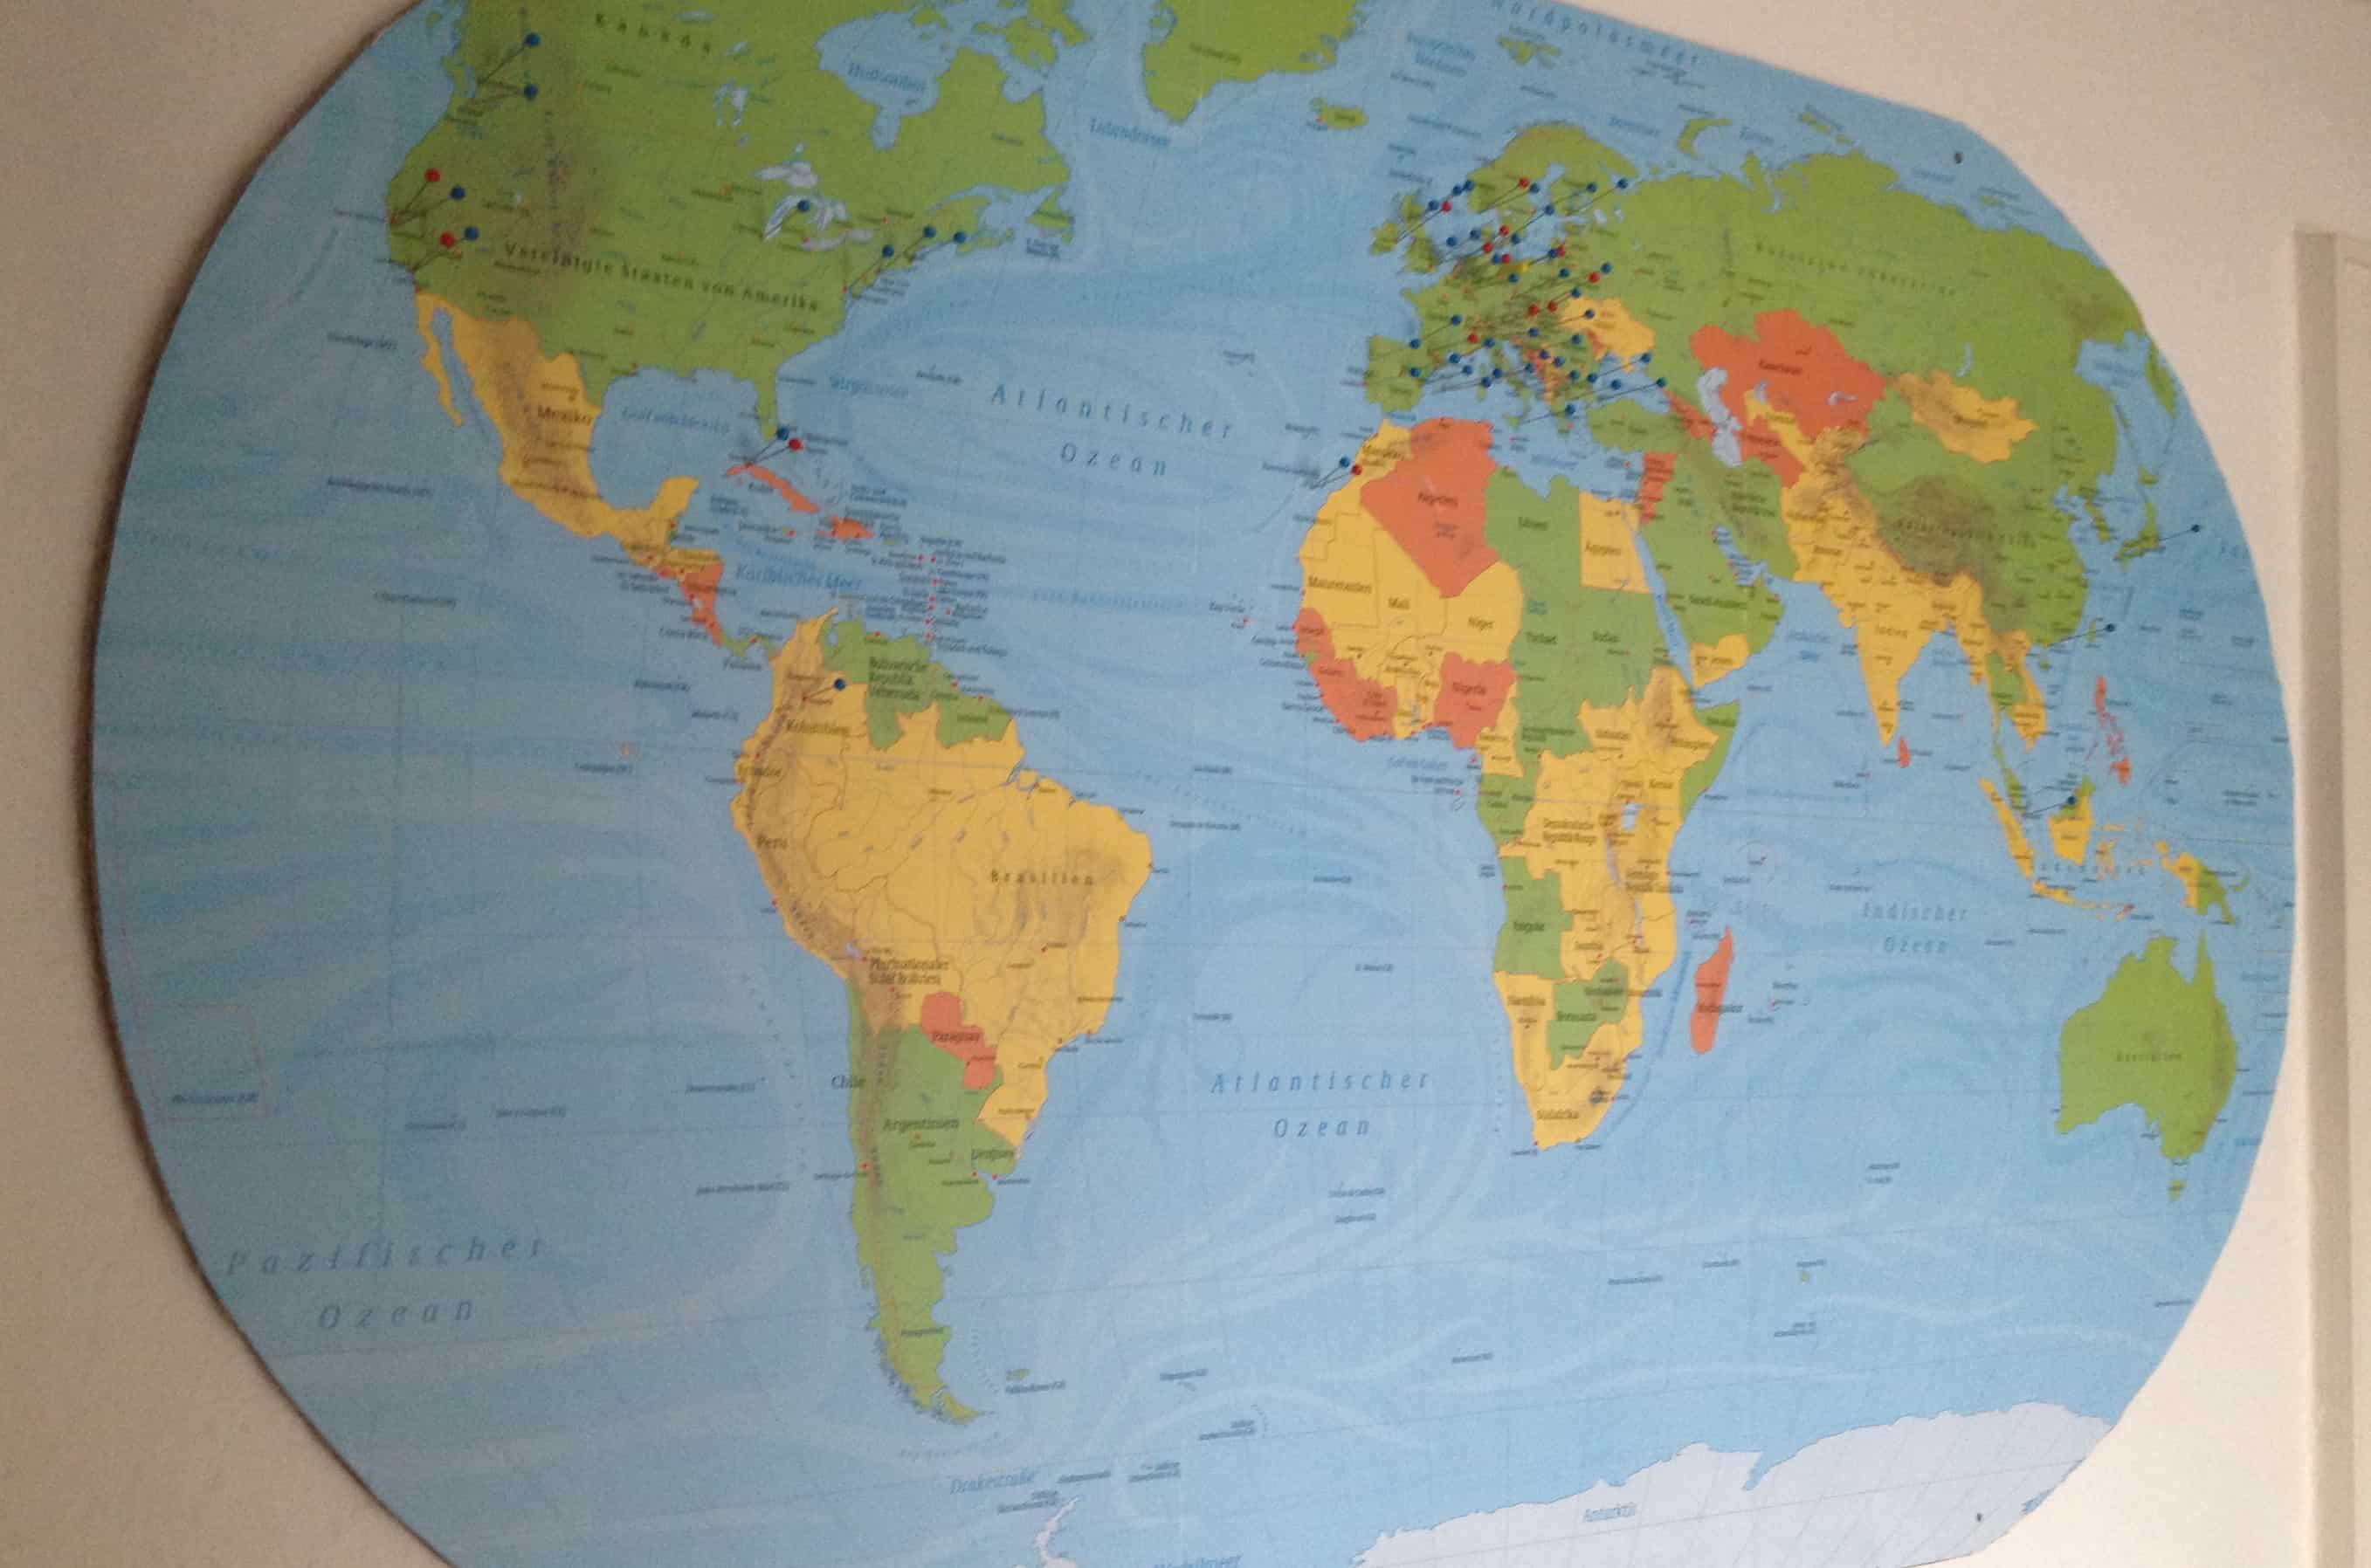 Kostenlose Weltkarte Europakarte Inkl Bastelanleitung Travel